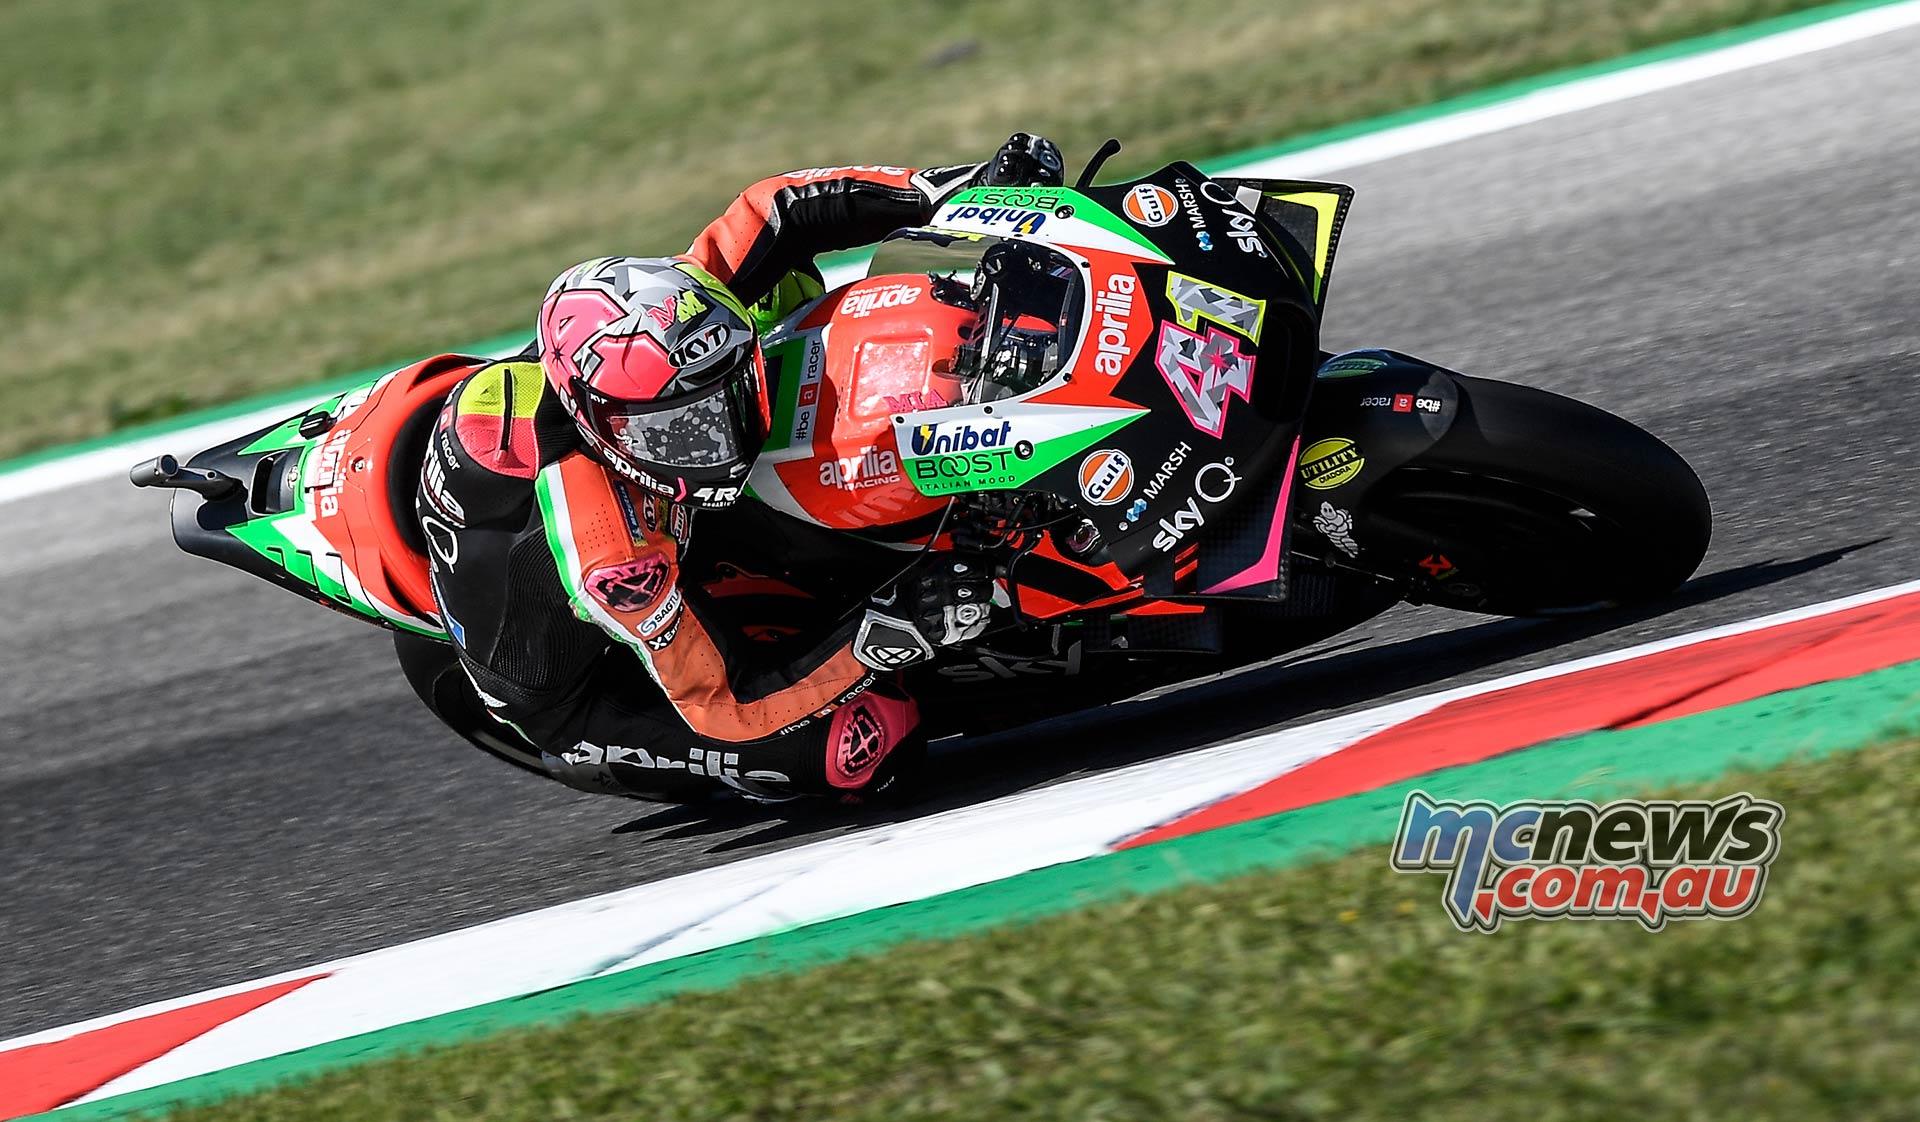 MotoGP Rnd Misano QP Aleix Espargaro